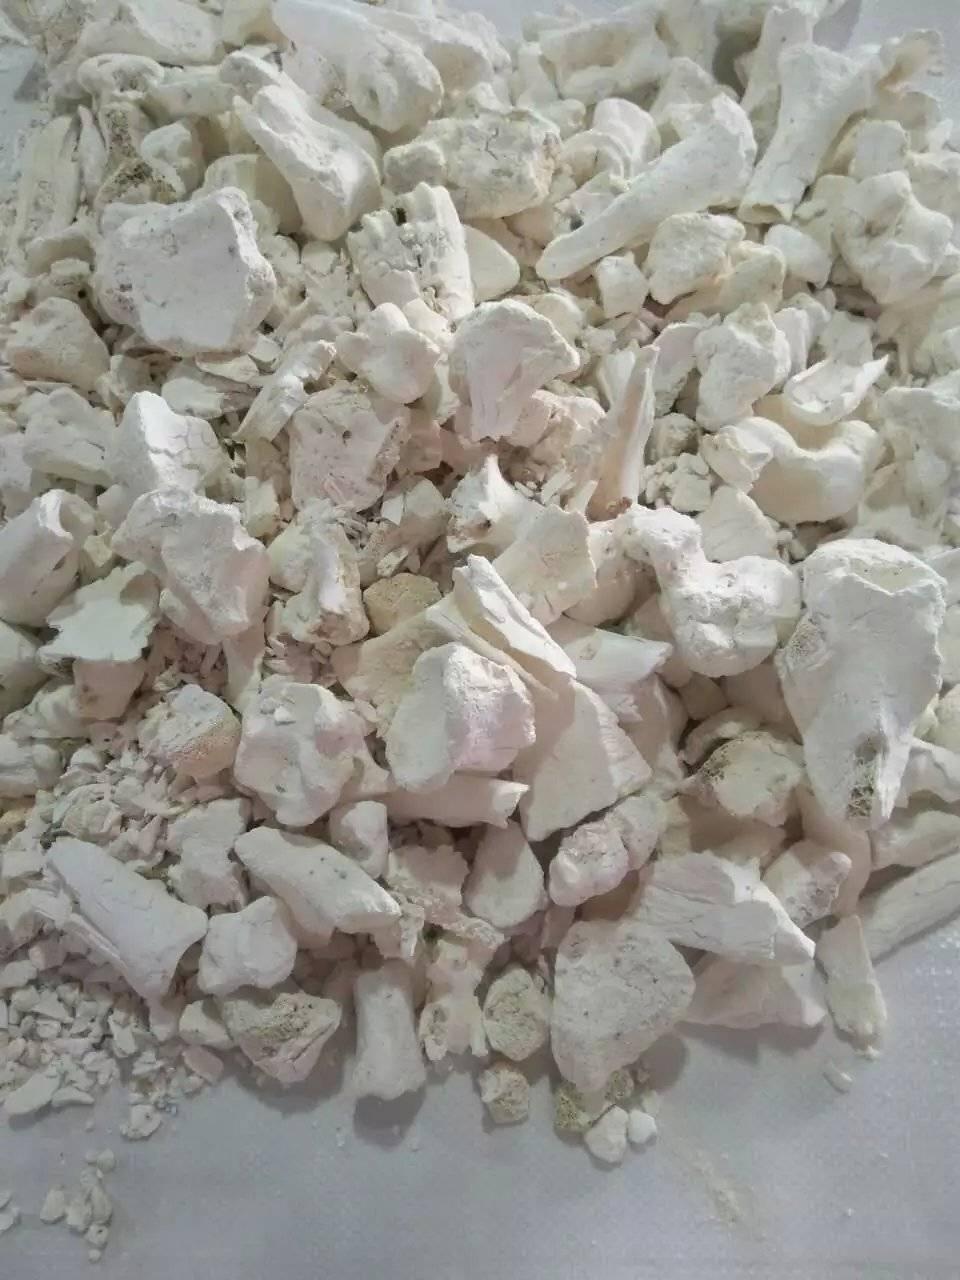 The Best calcined Bovine Bone for Bone China